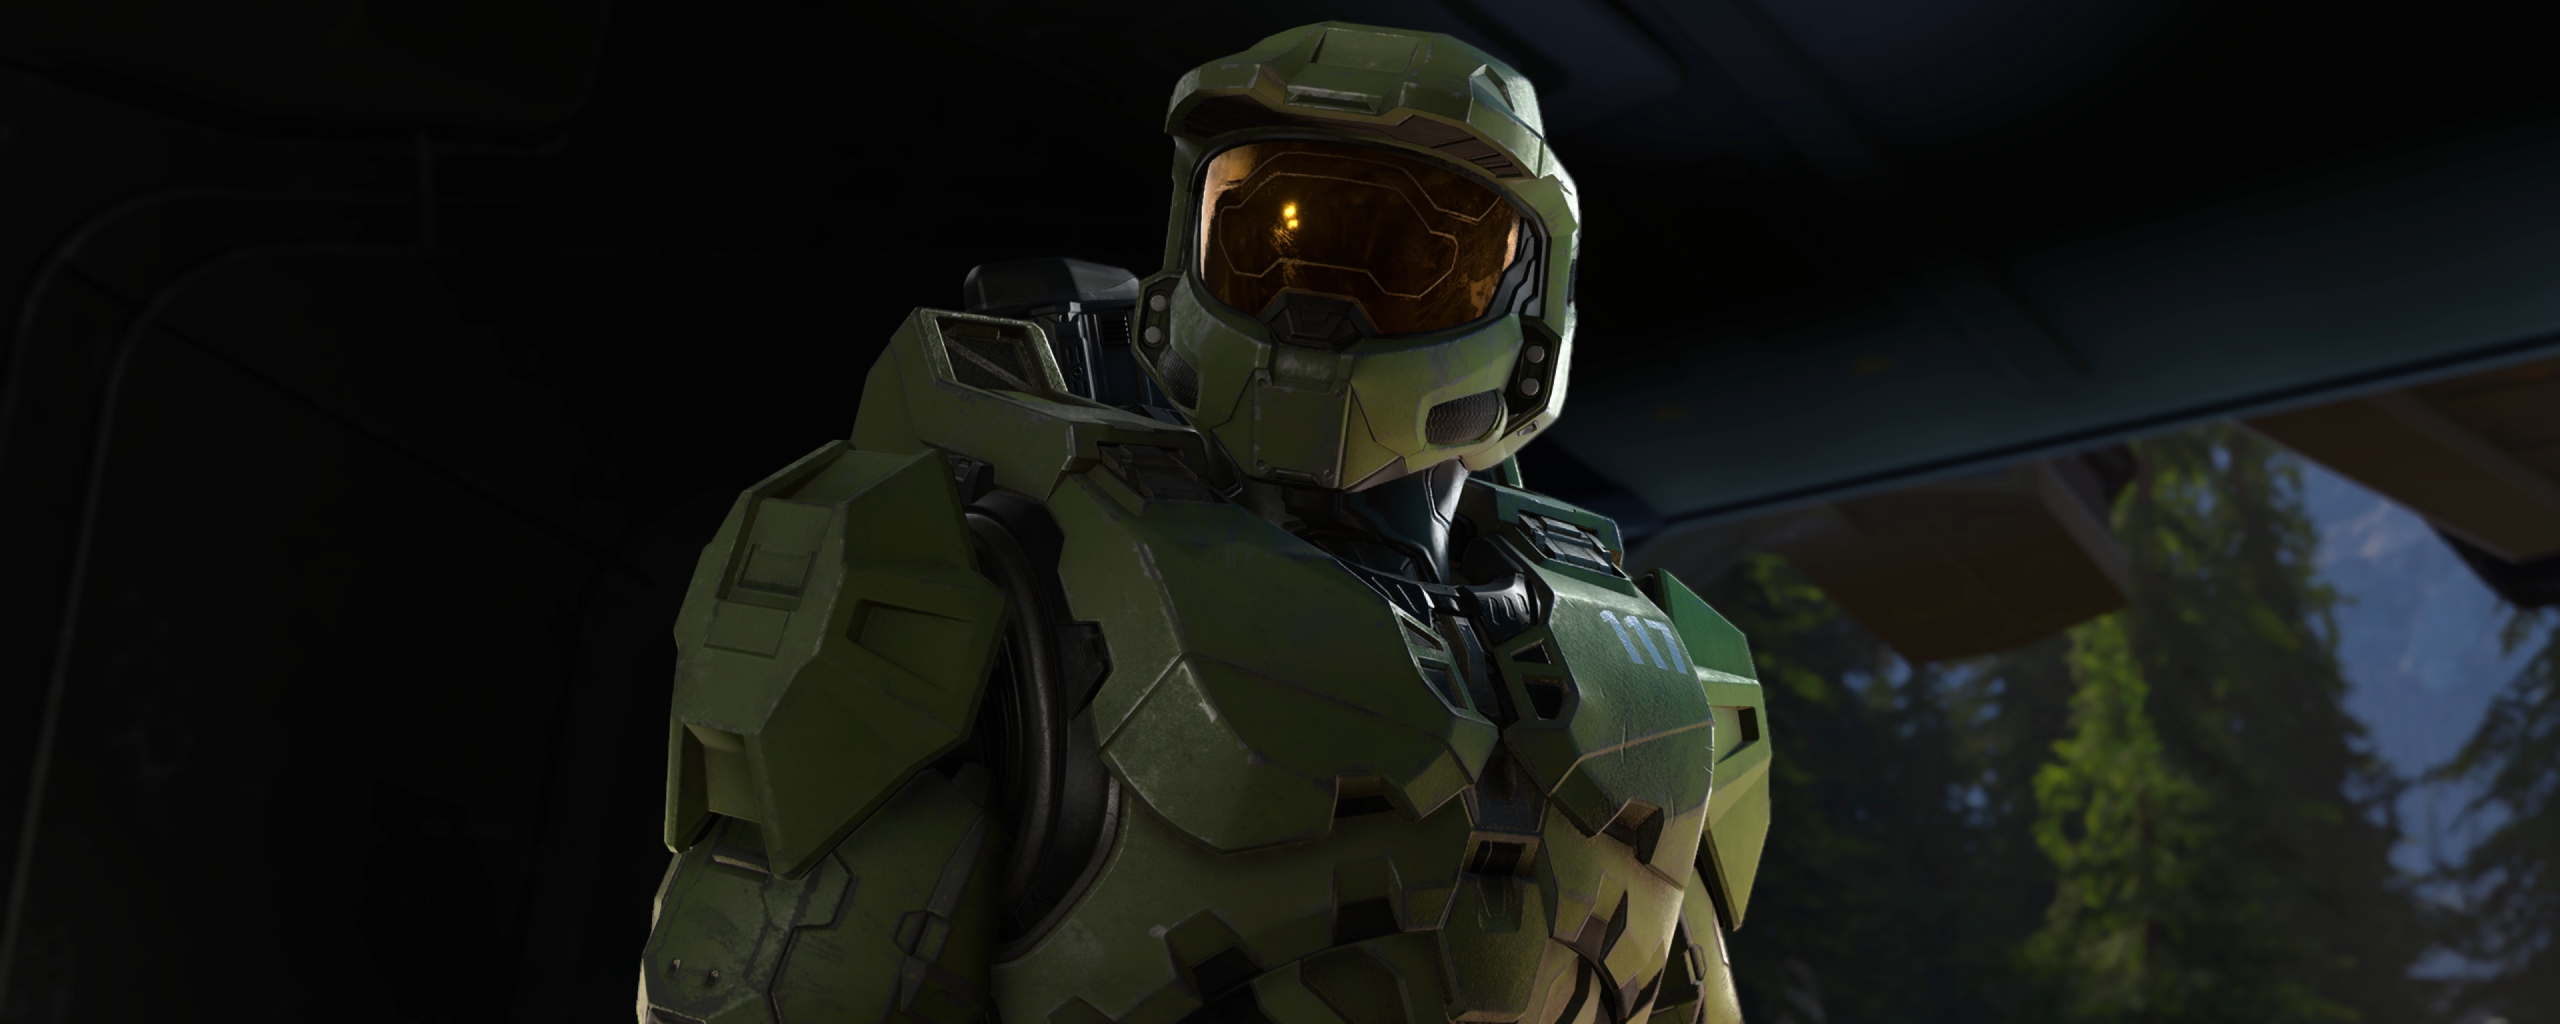 New Halo Infinite 4K Wallpaper in 2560x1024 Resolution